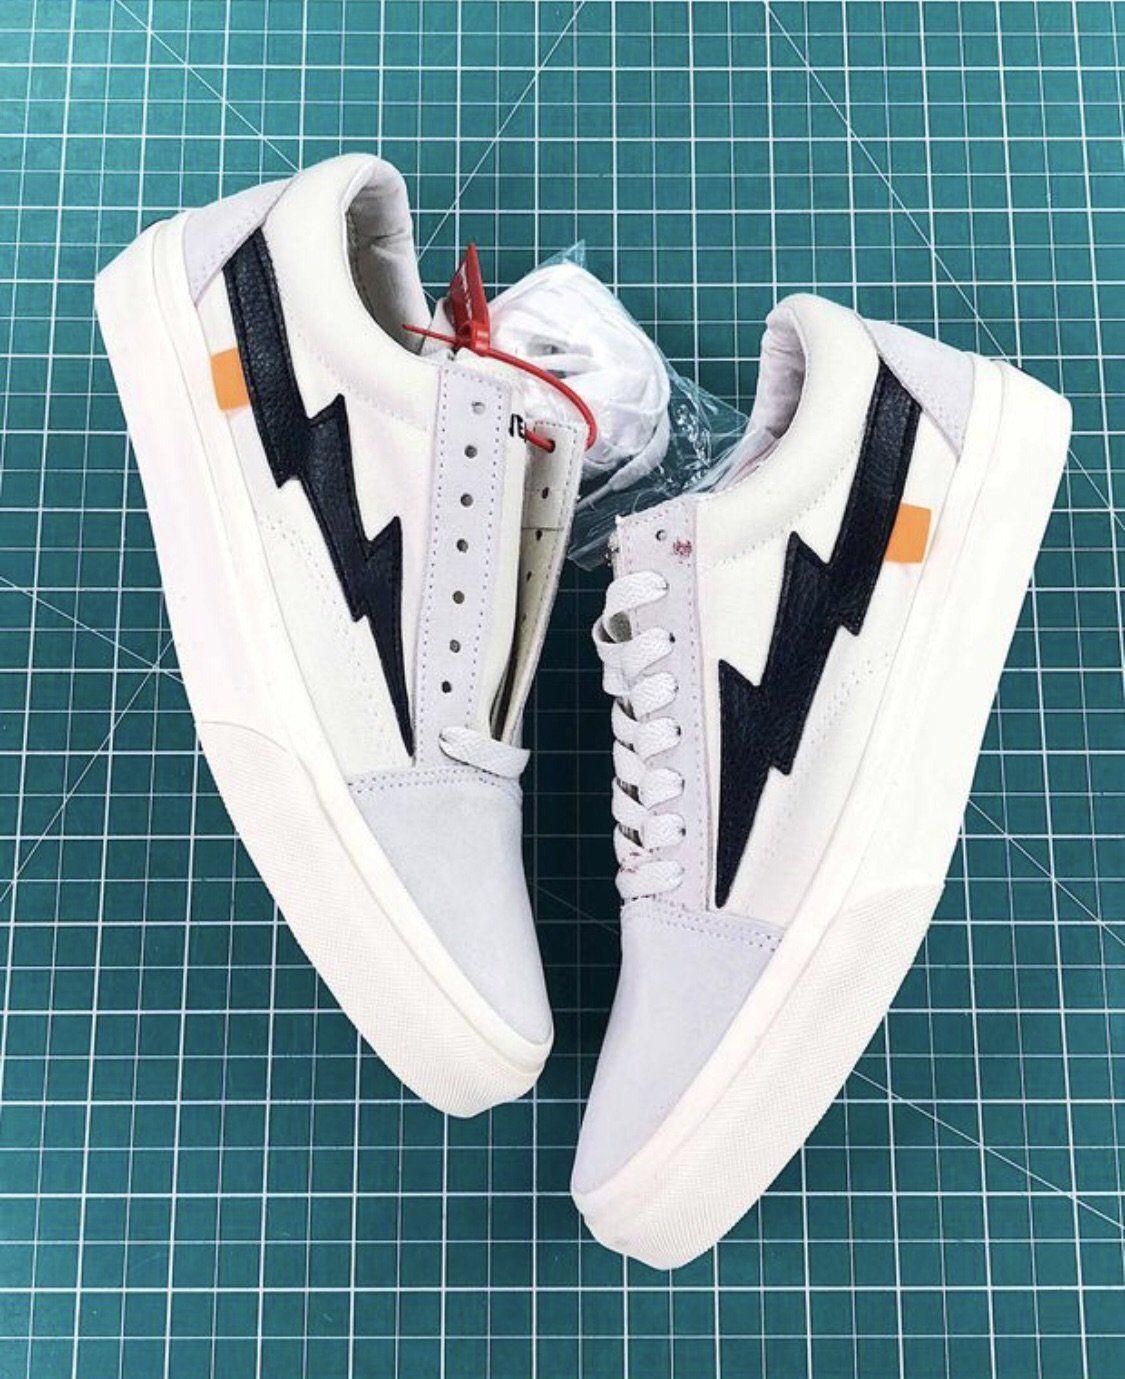 Offwhite Revenge X Storm Sneaker Kicks Yeezy Sneakerhead Nike Streetwear Jordans Shoes Supreme B Sneakers Men Fashion Mens Nike Shoes Mens Vans Shoes